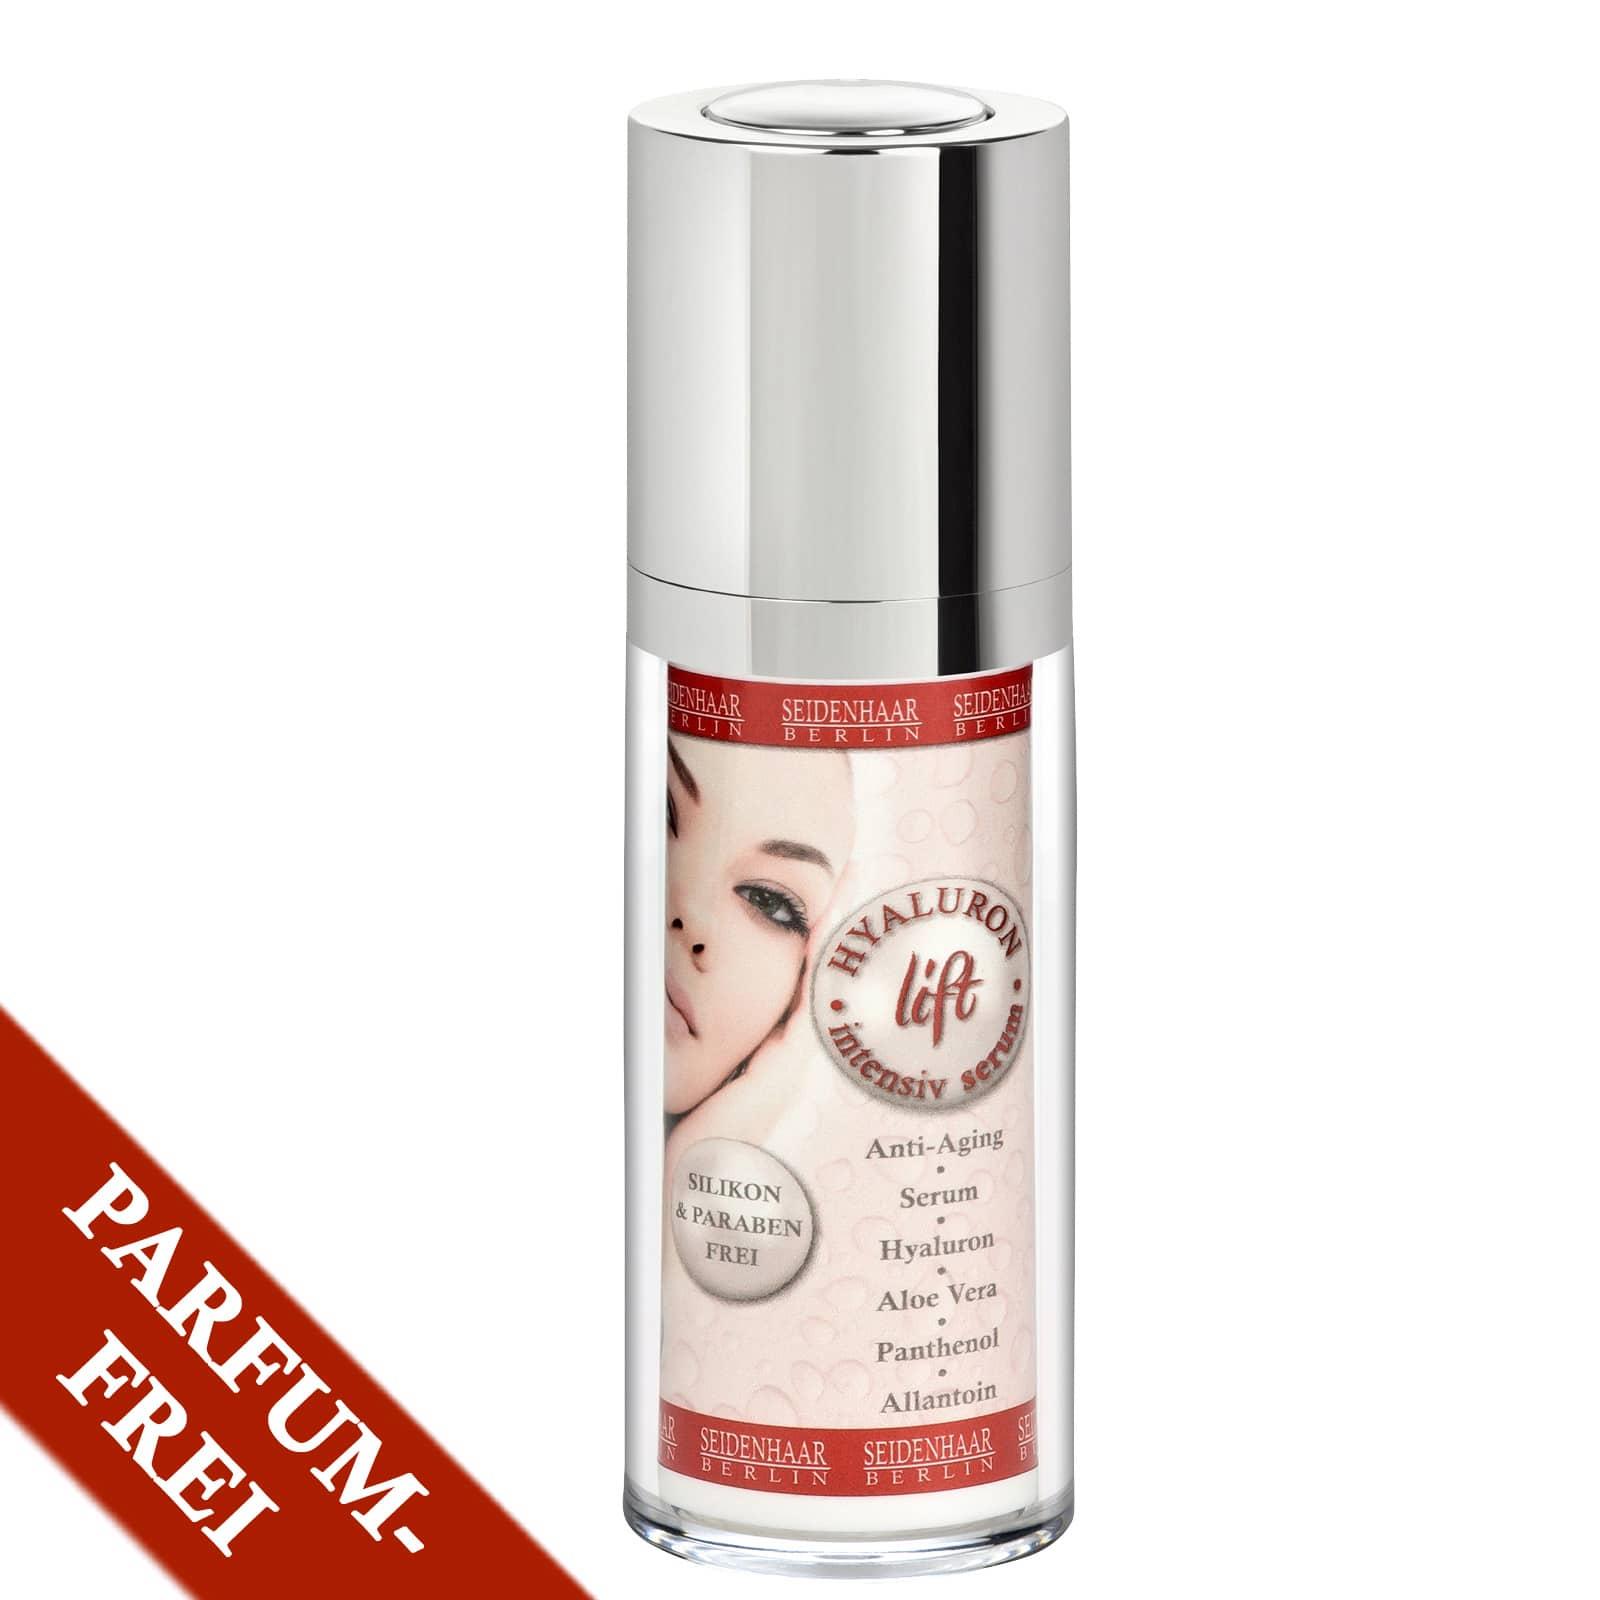 Anti Aging Hyaluron Lift sensitiv - parfümfrei